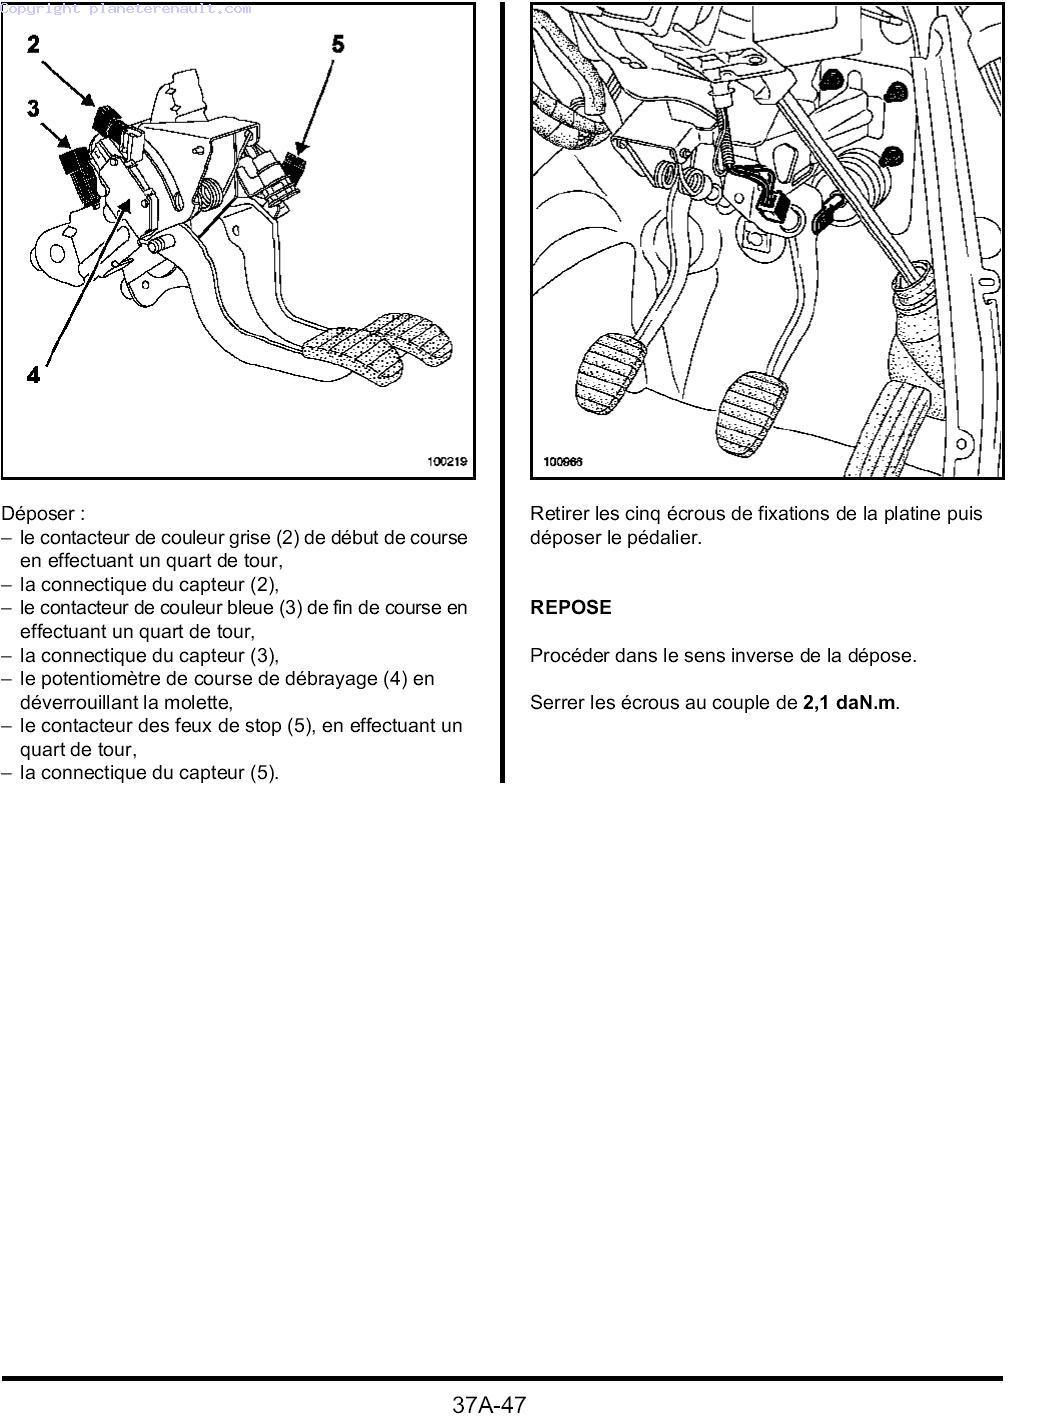 Probleme pedale embrayage scenic 2